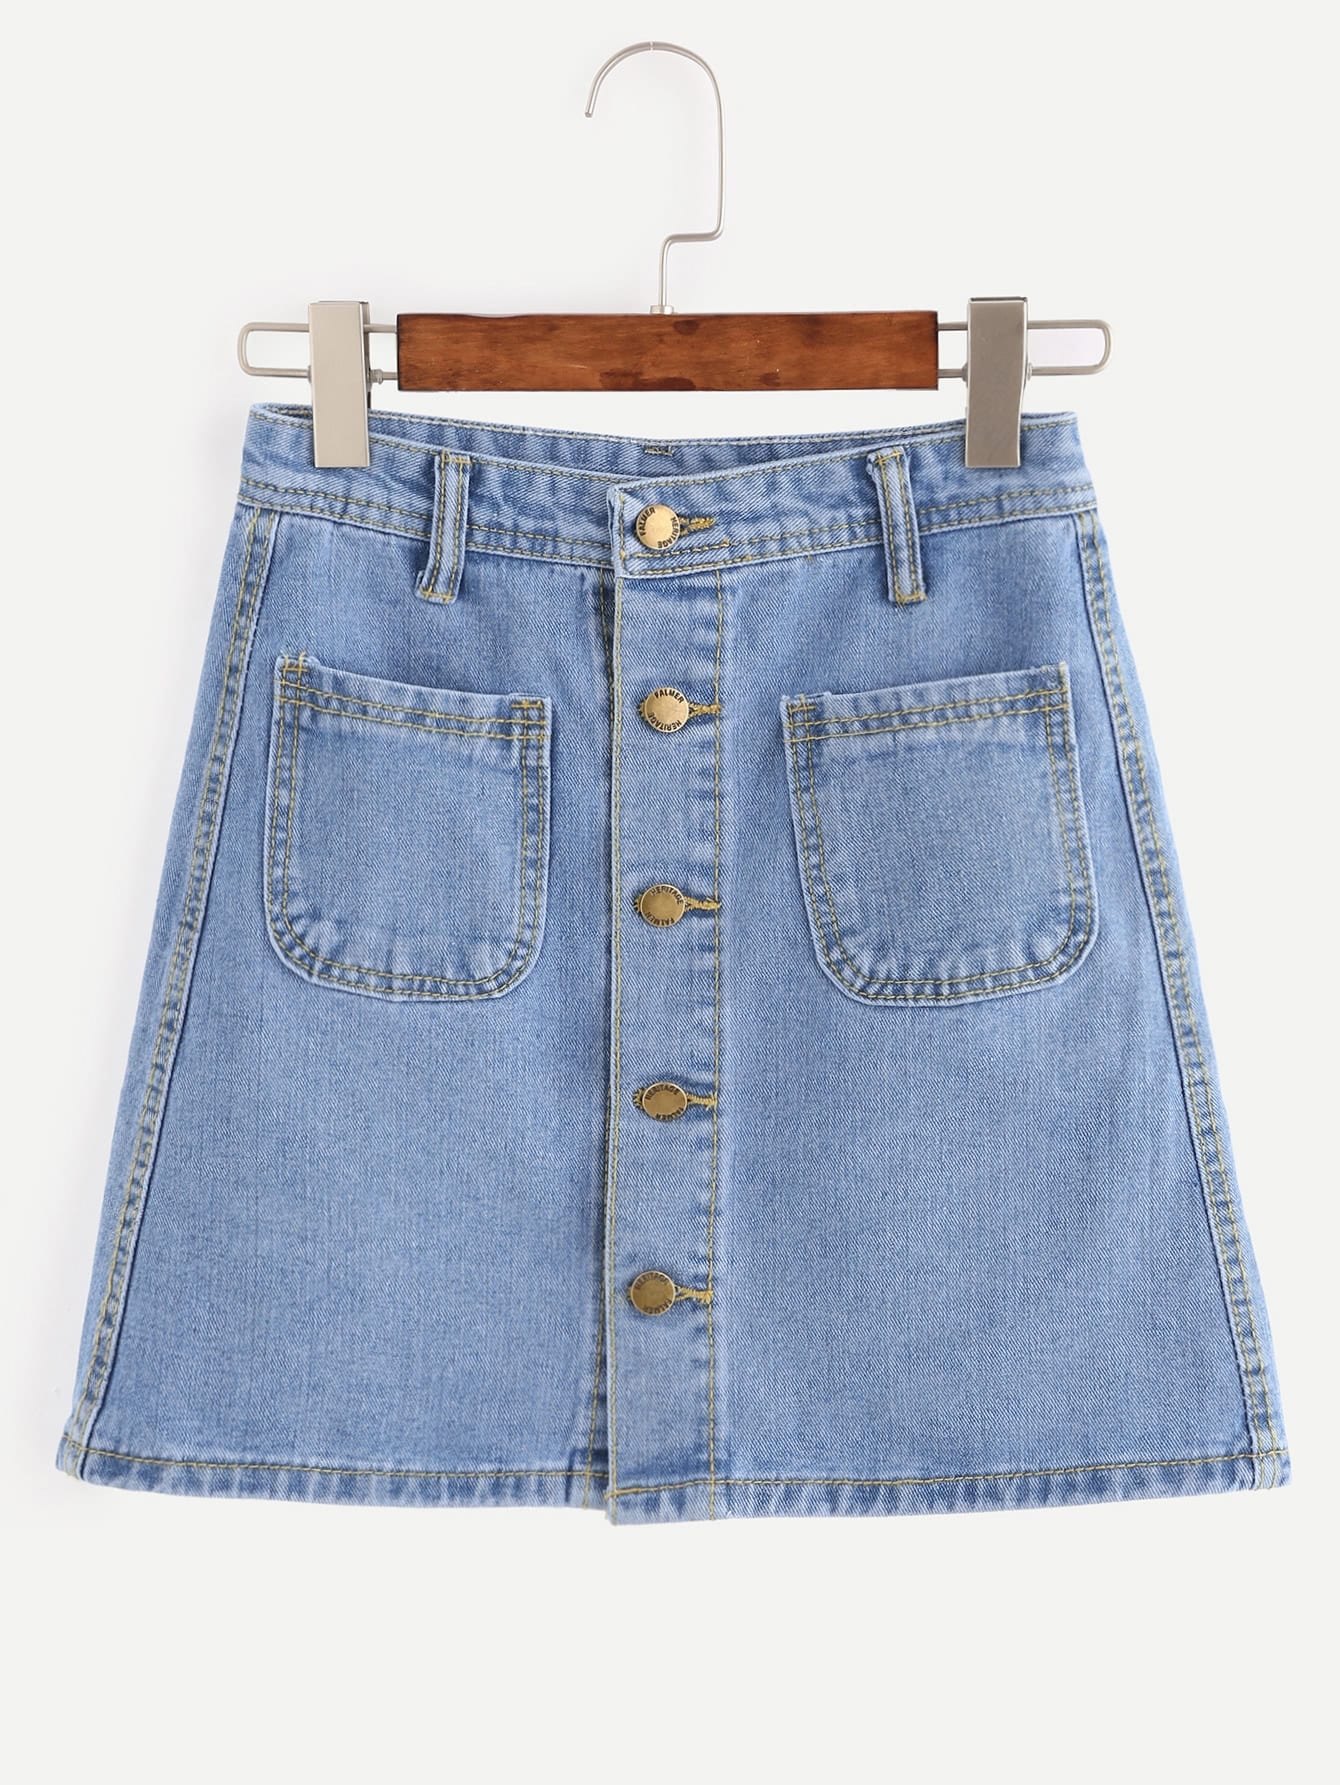 Image of Blue Button Front Dual Pocket A Line Denim Skirt